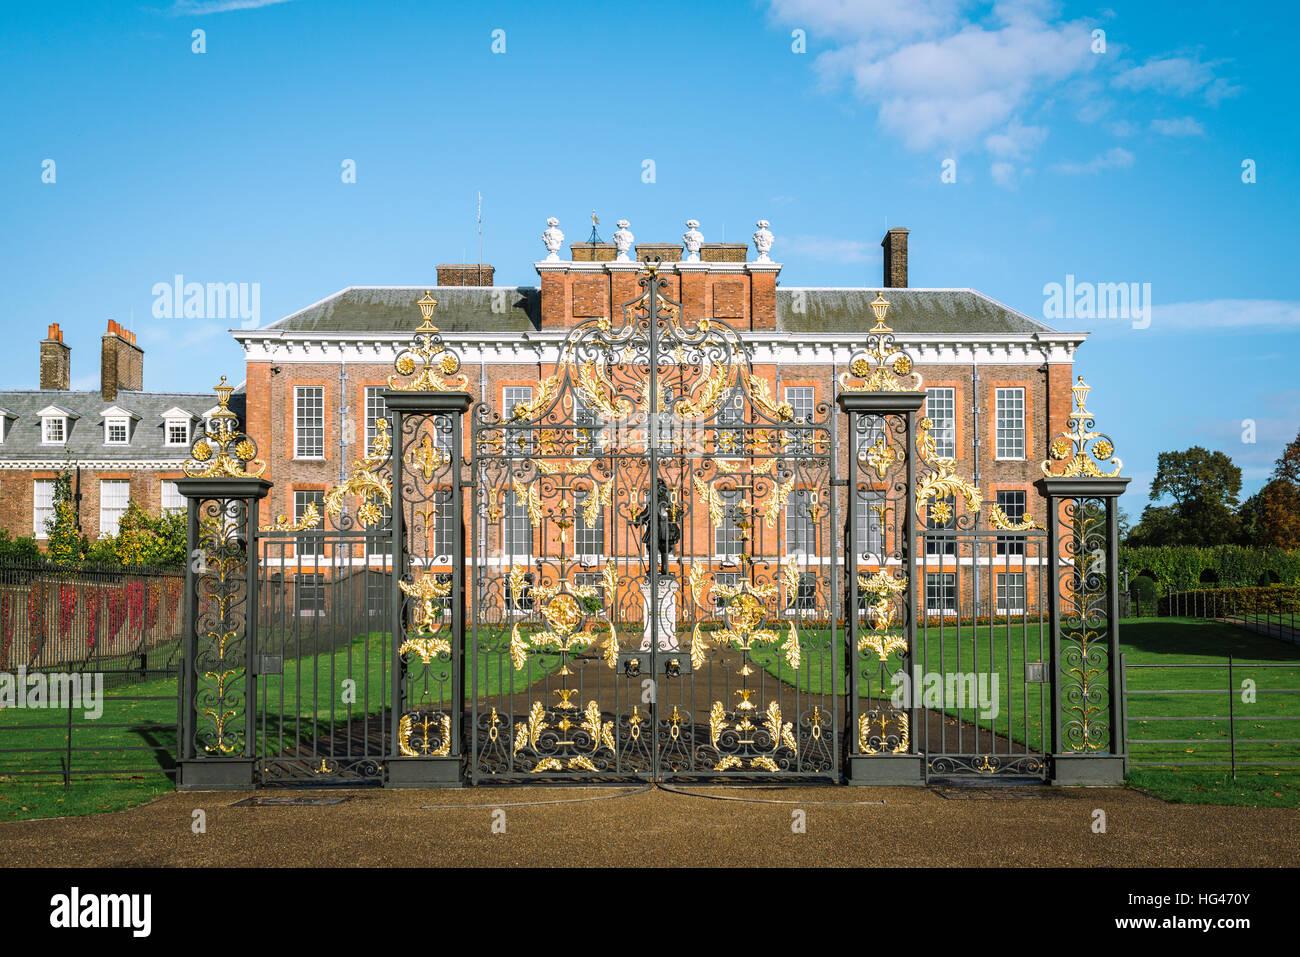 London, United Kingdom - October 17, 2016: Outside of Kensington Palace in London, England. - Stock Image